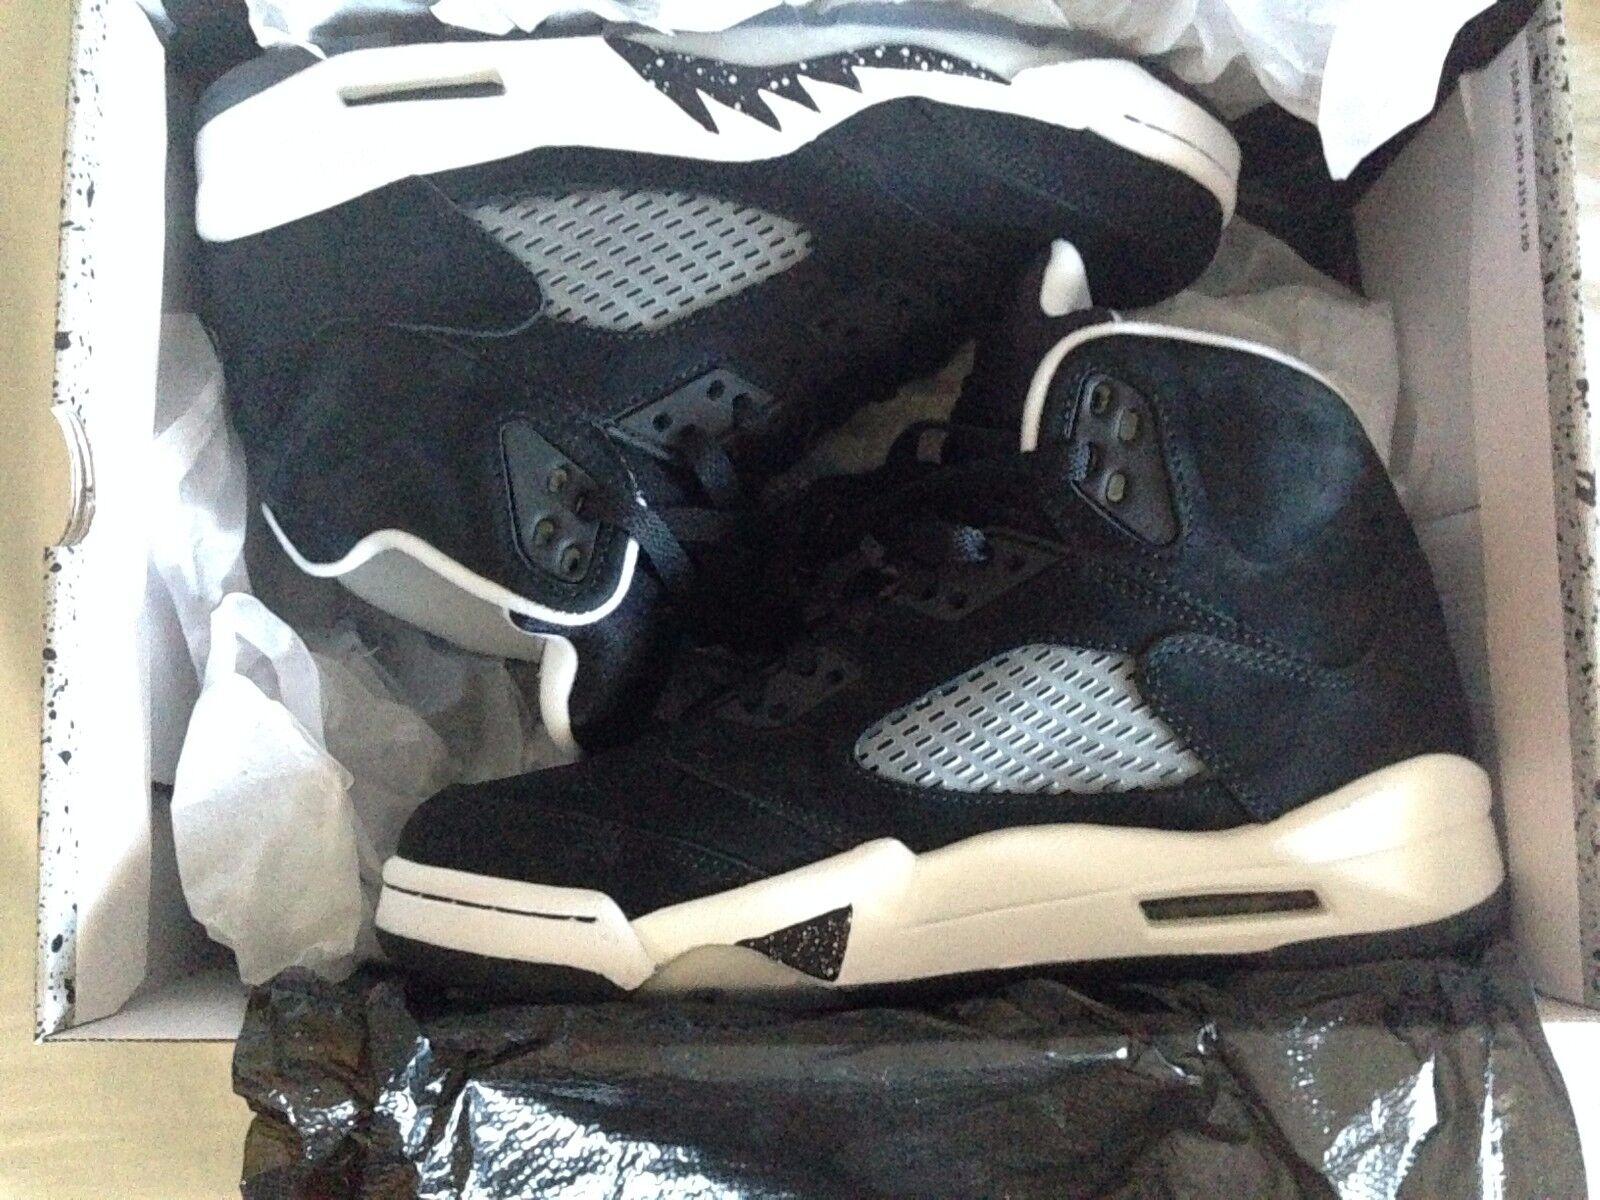 Nike Air Jordan 5 Retro Black Cool Grey-White 136027 035